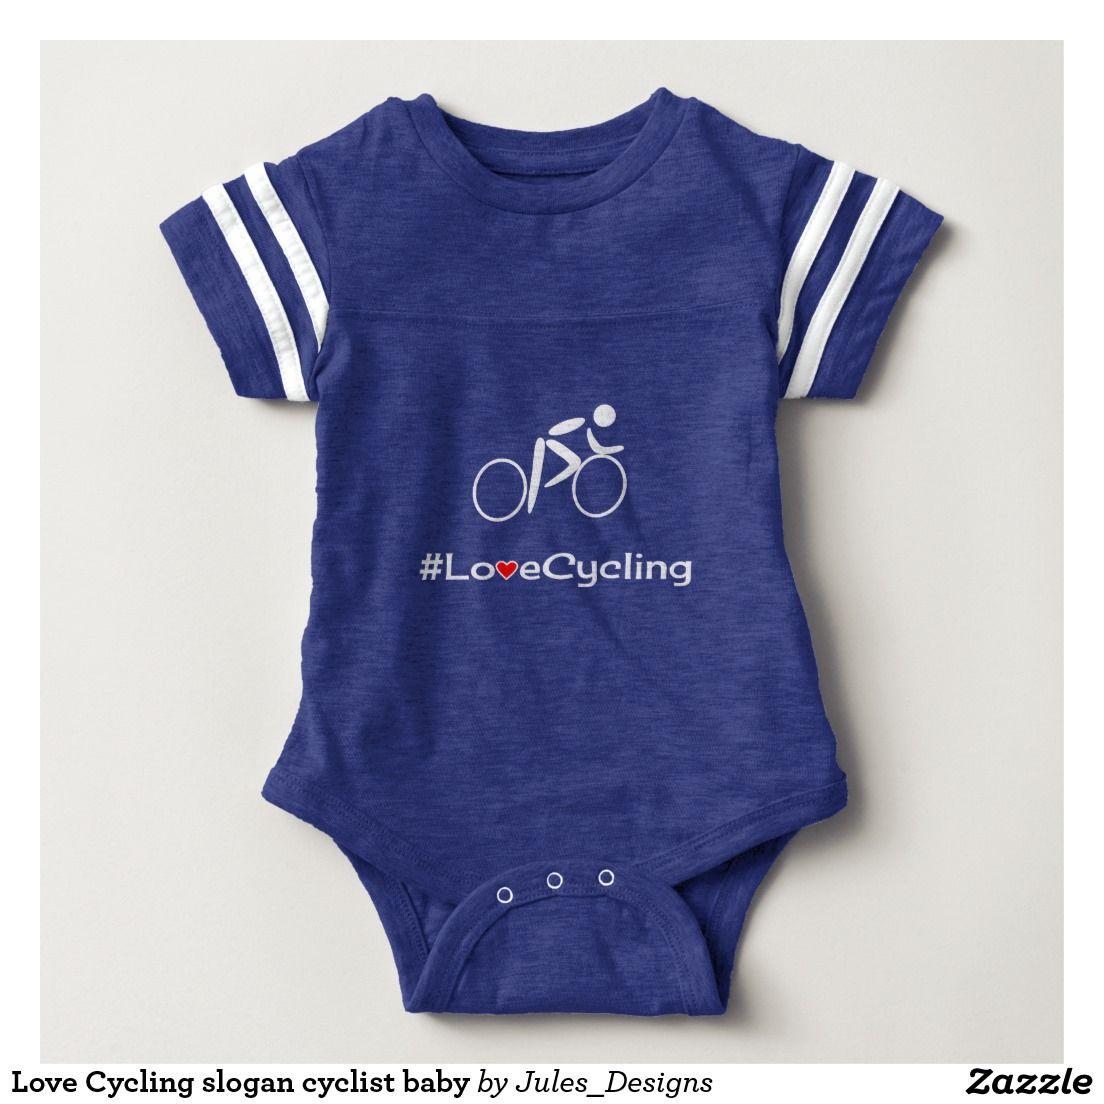 618d279839f Funny Baby Slogan T Shirts - BCD Tofu House